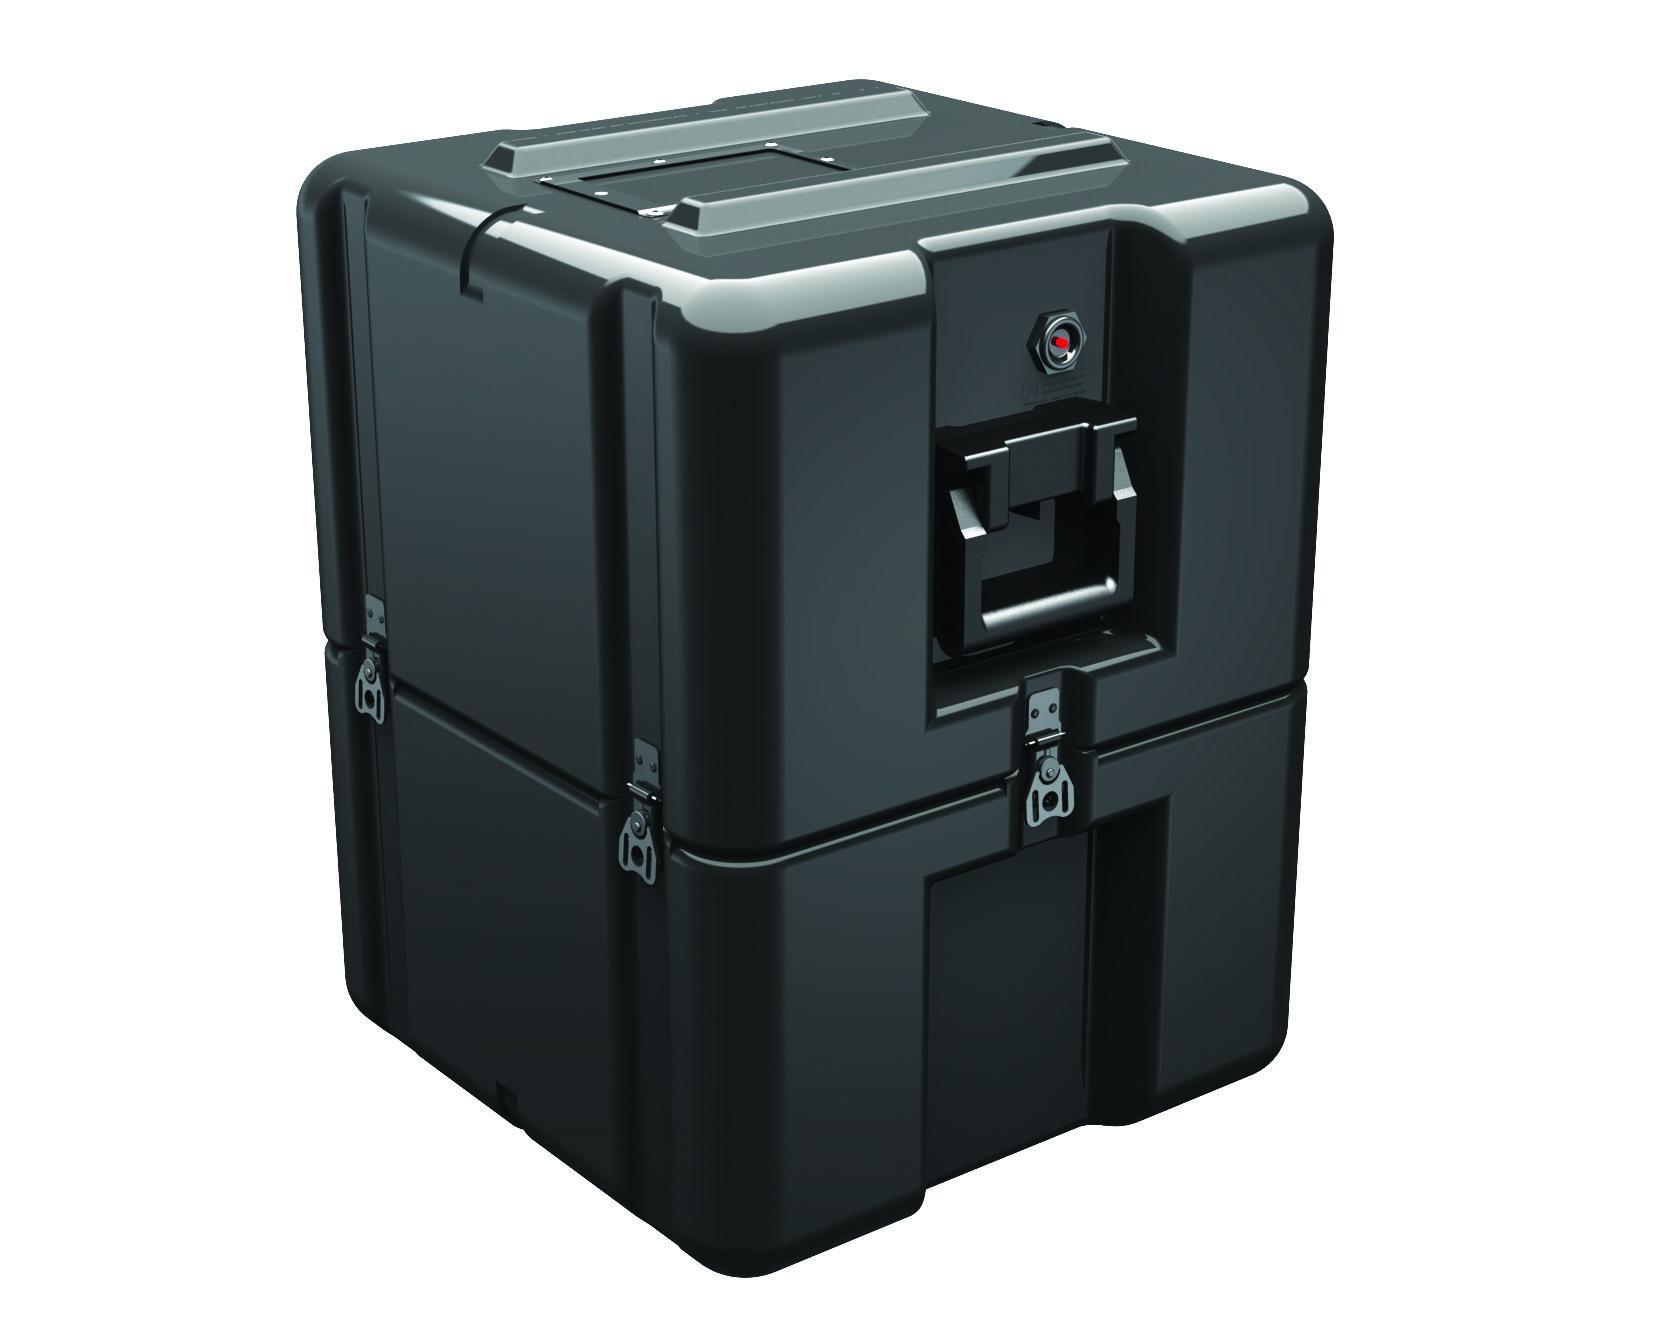 AL1616-1012 - AL1616-1012 Pelican Case Single Lid Transport Case